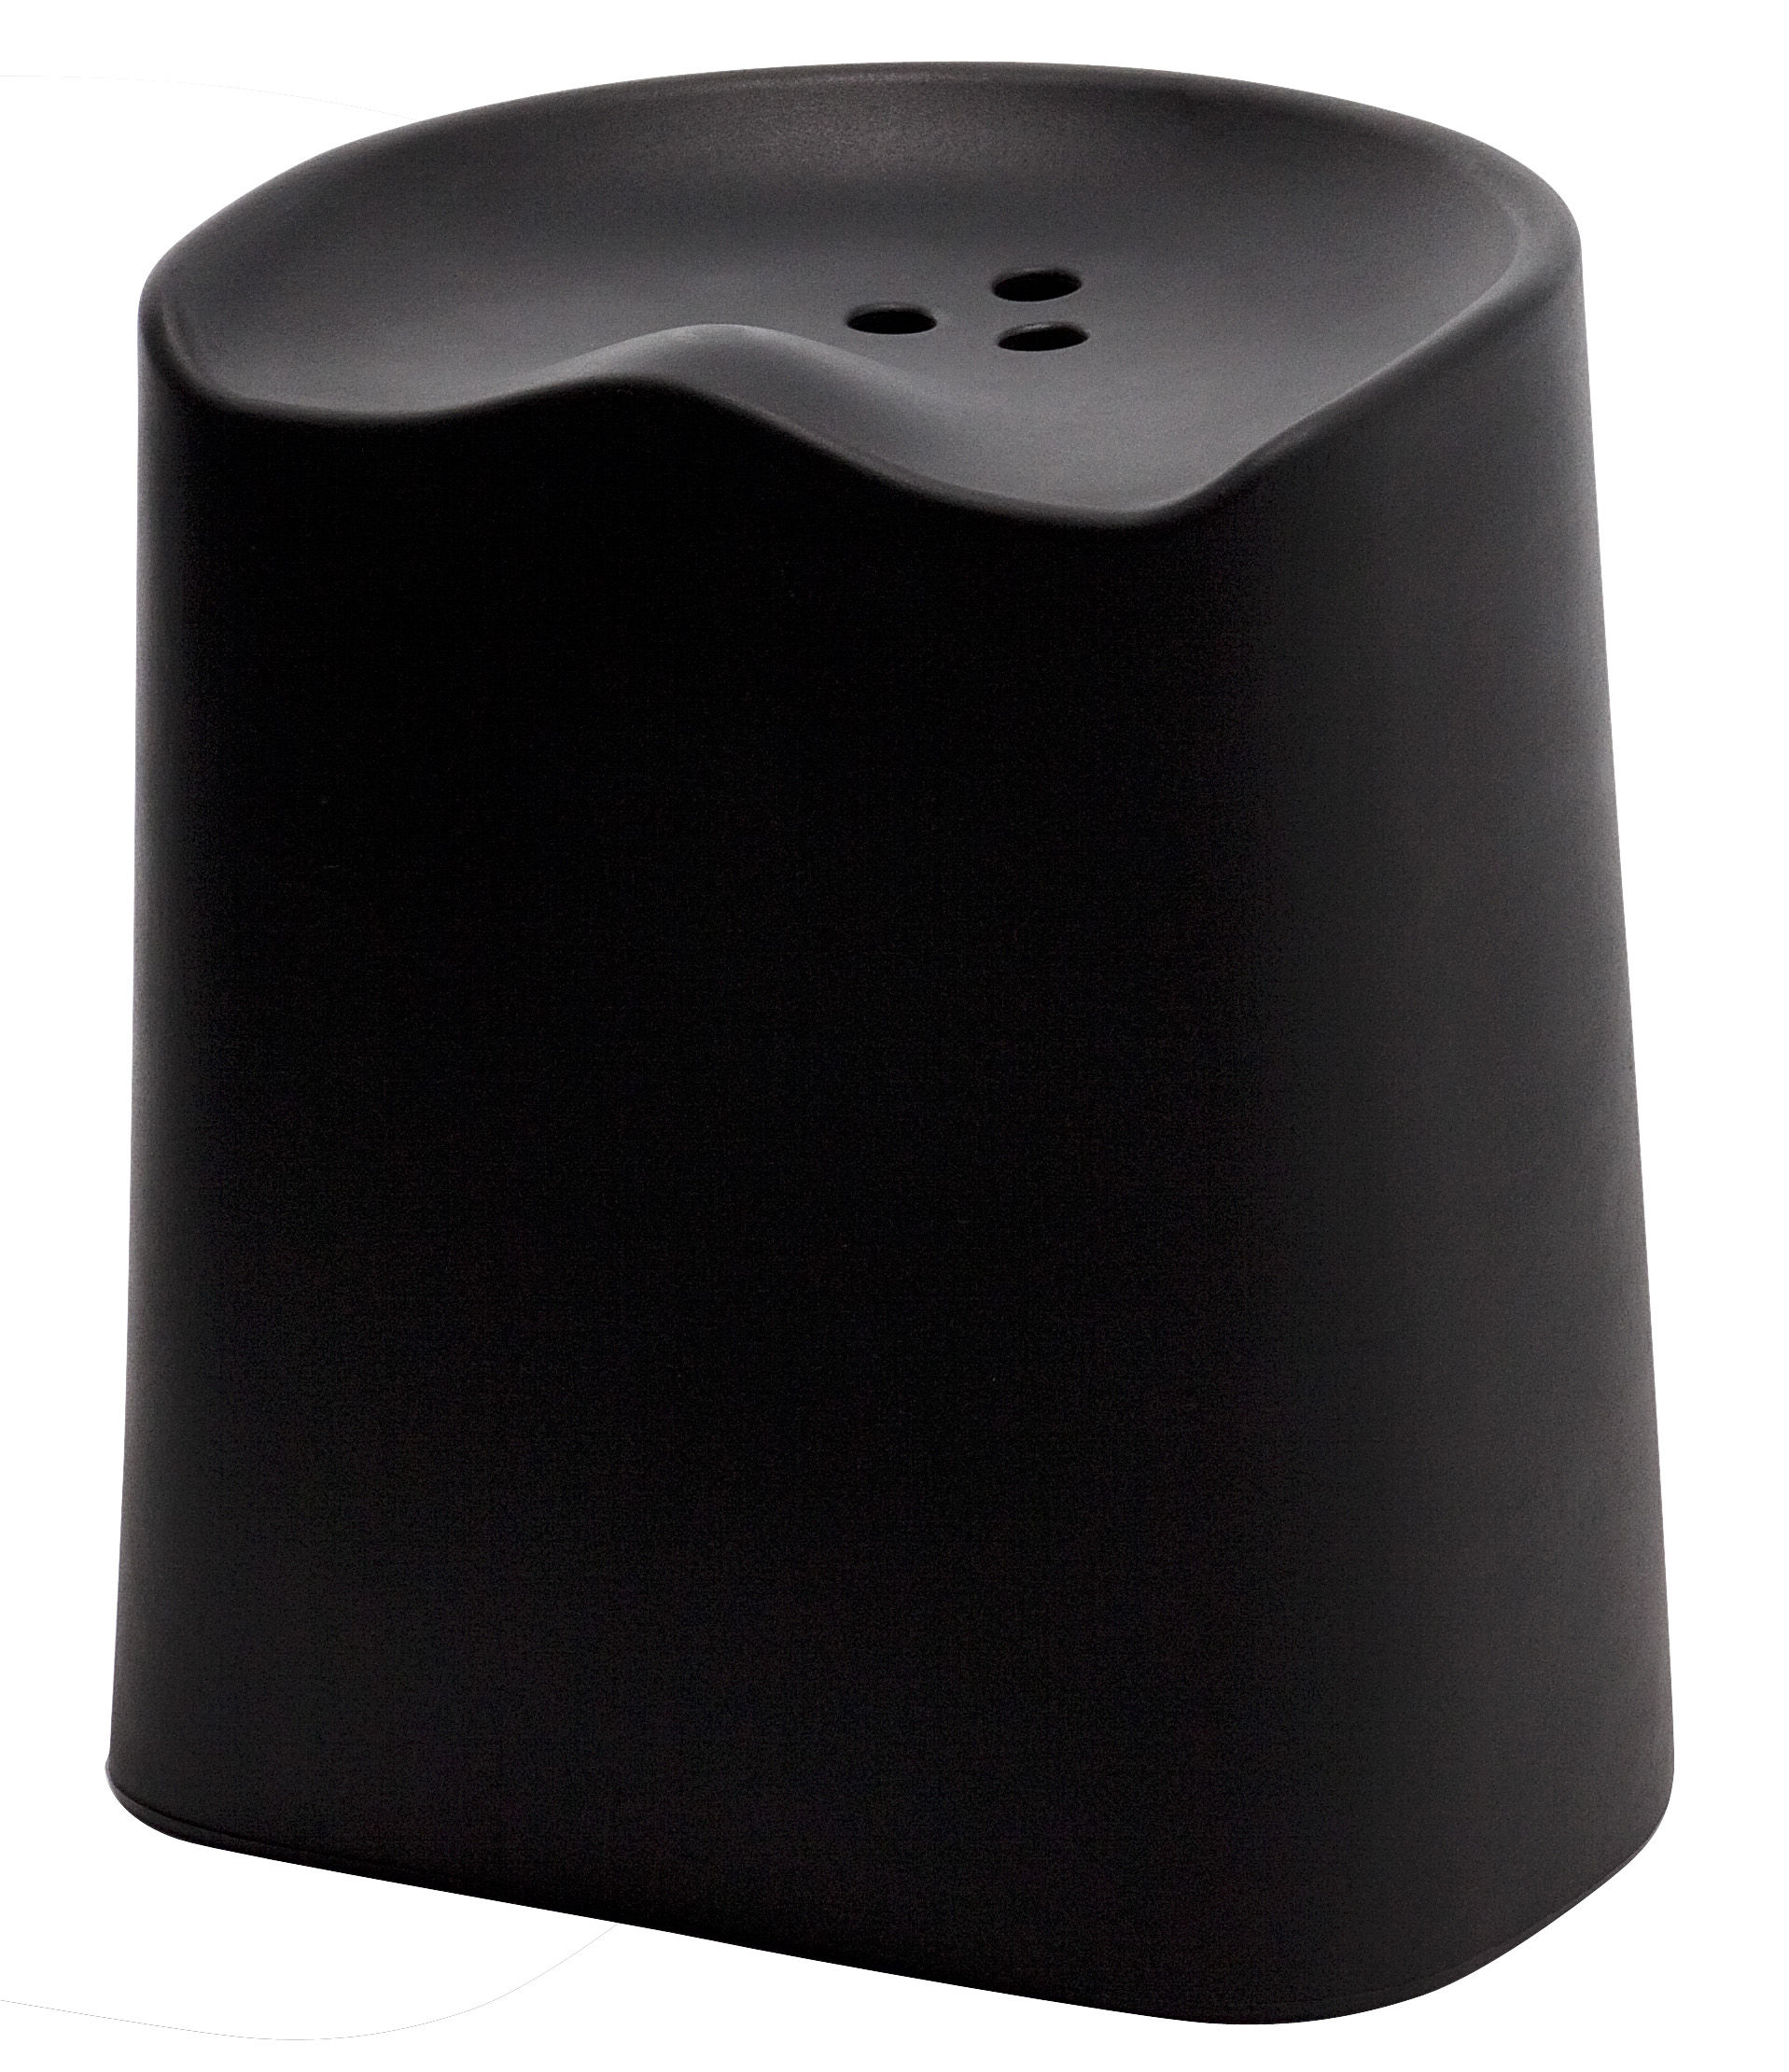 Möbel - Hocker - Butt Stappelbarer Hocker H 49 cm - Established & Sons - Schwarz - Polypropylen